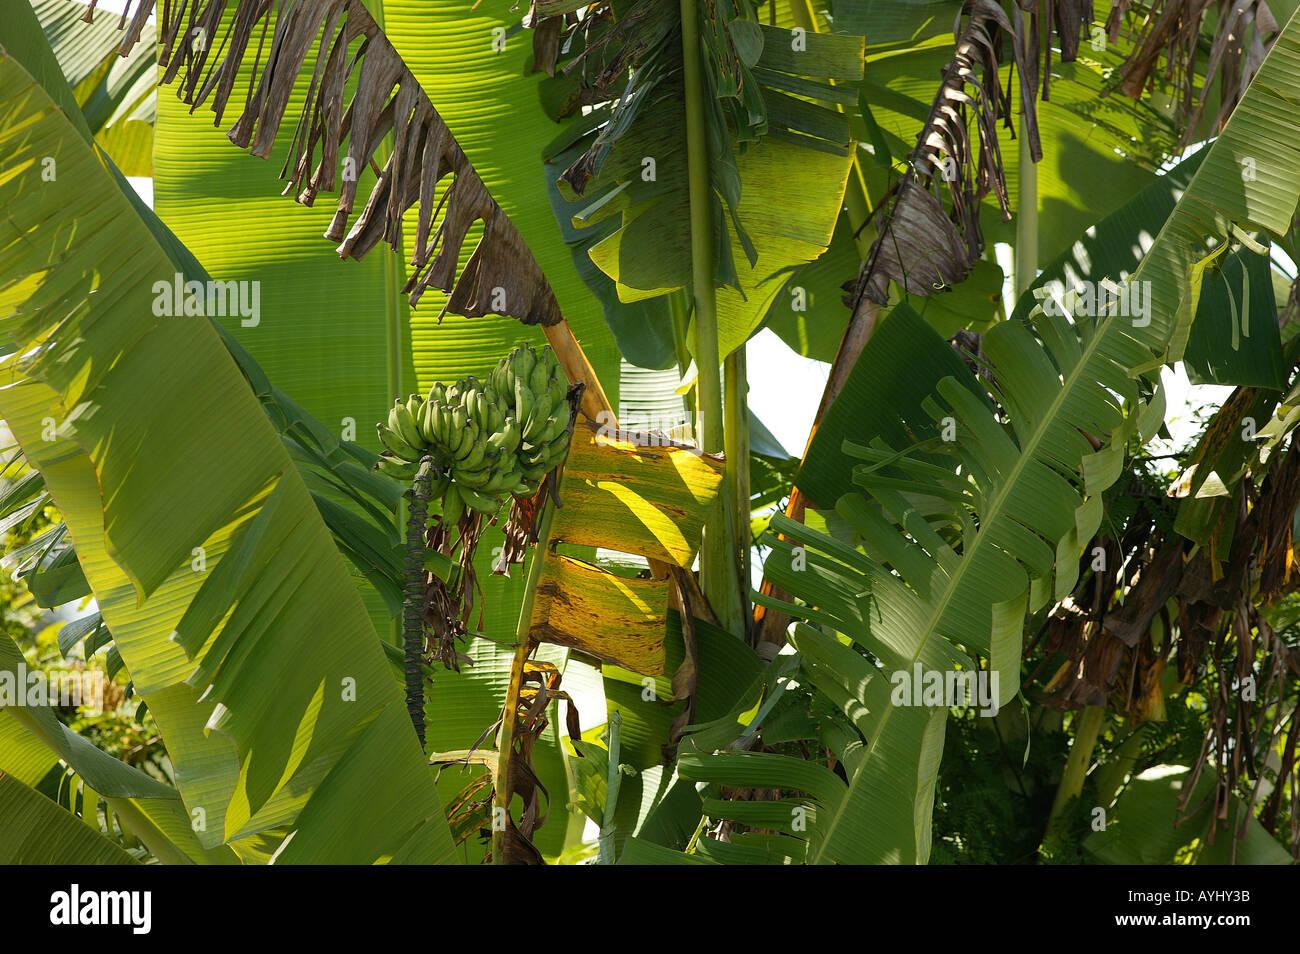 Bananenbaum am Solimes Brasilien Stock Photo